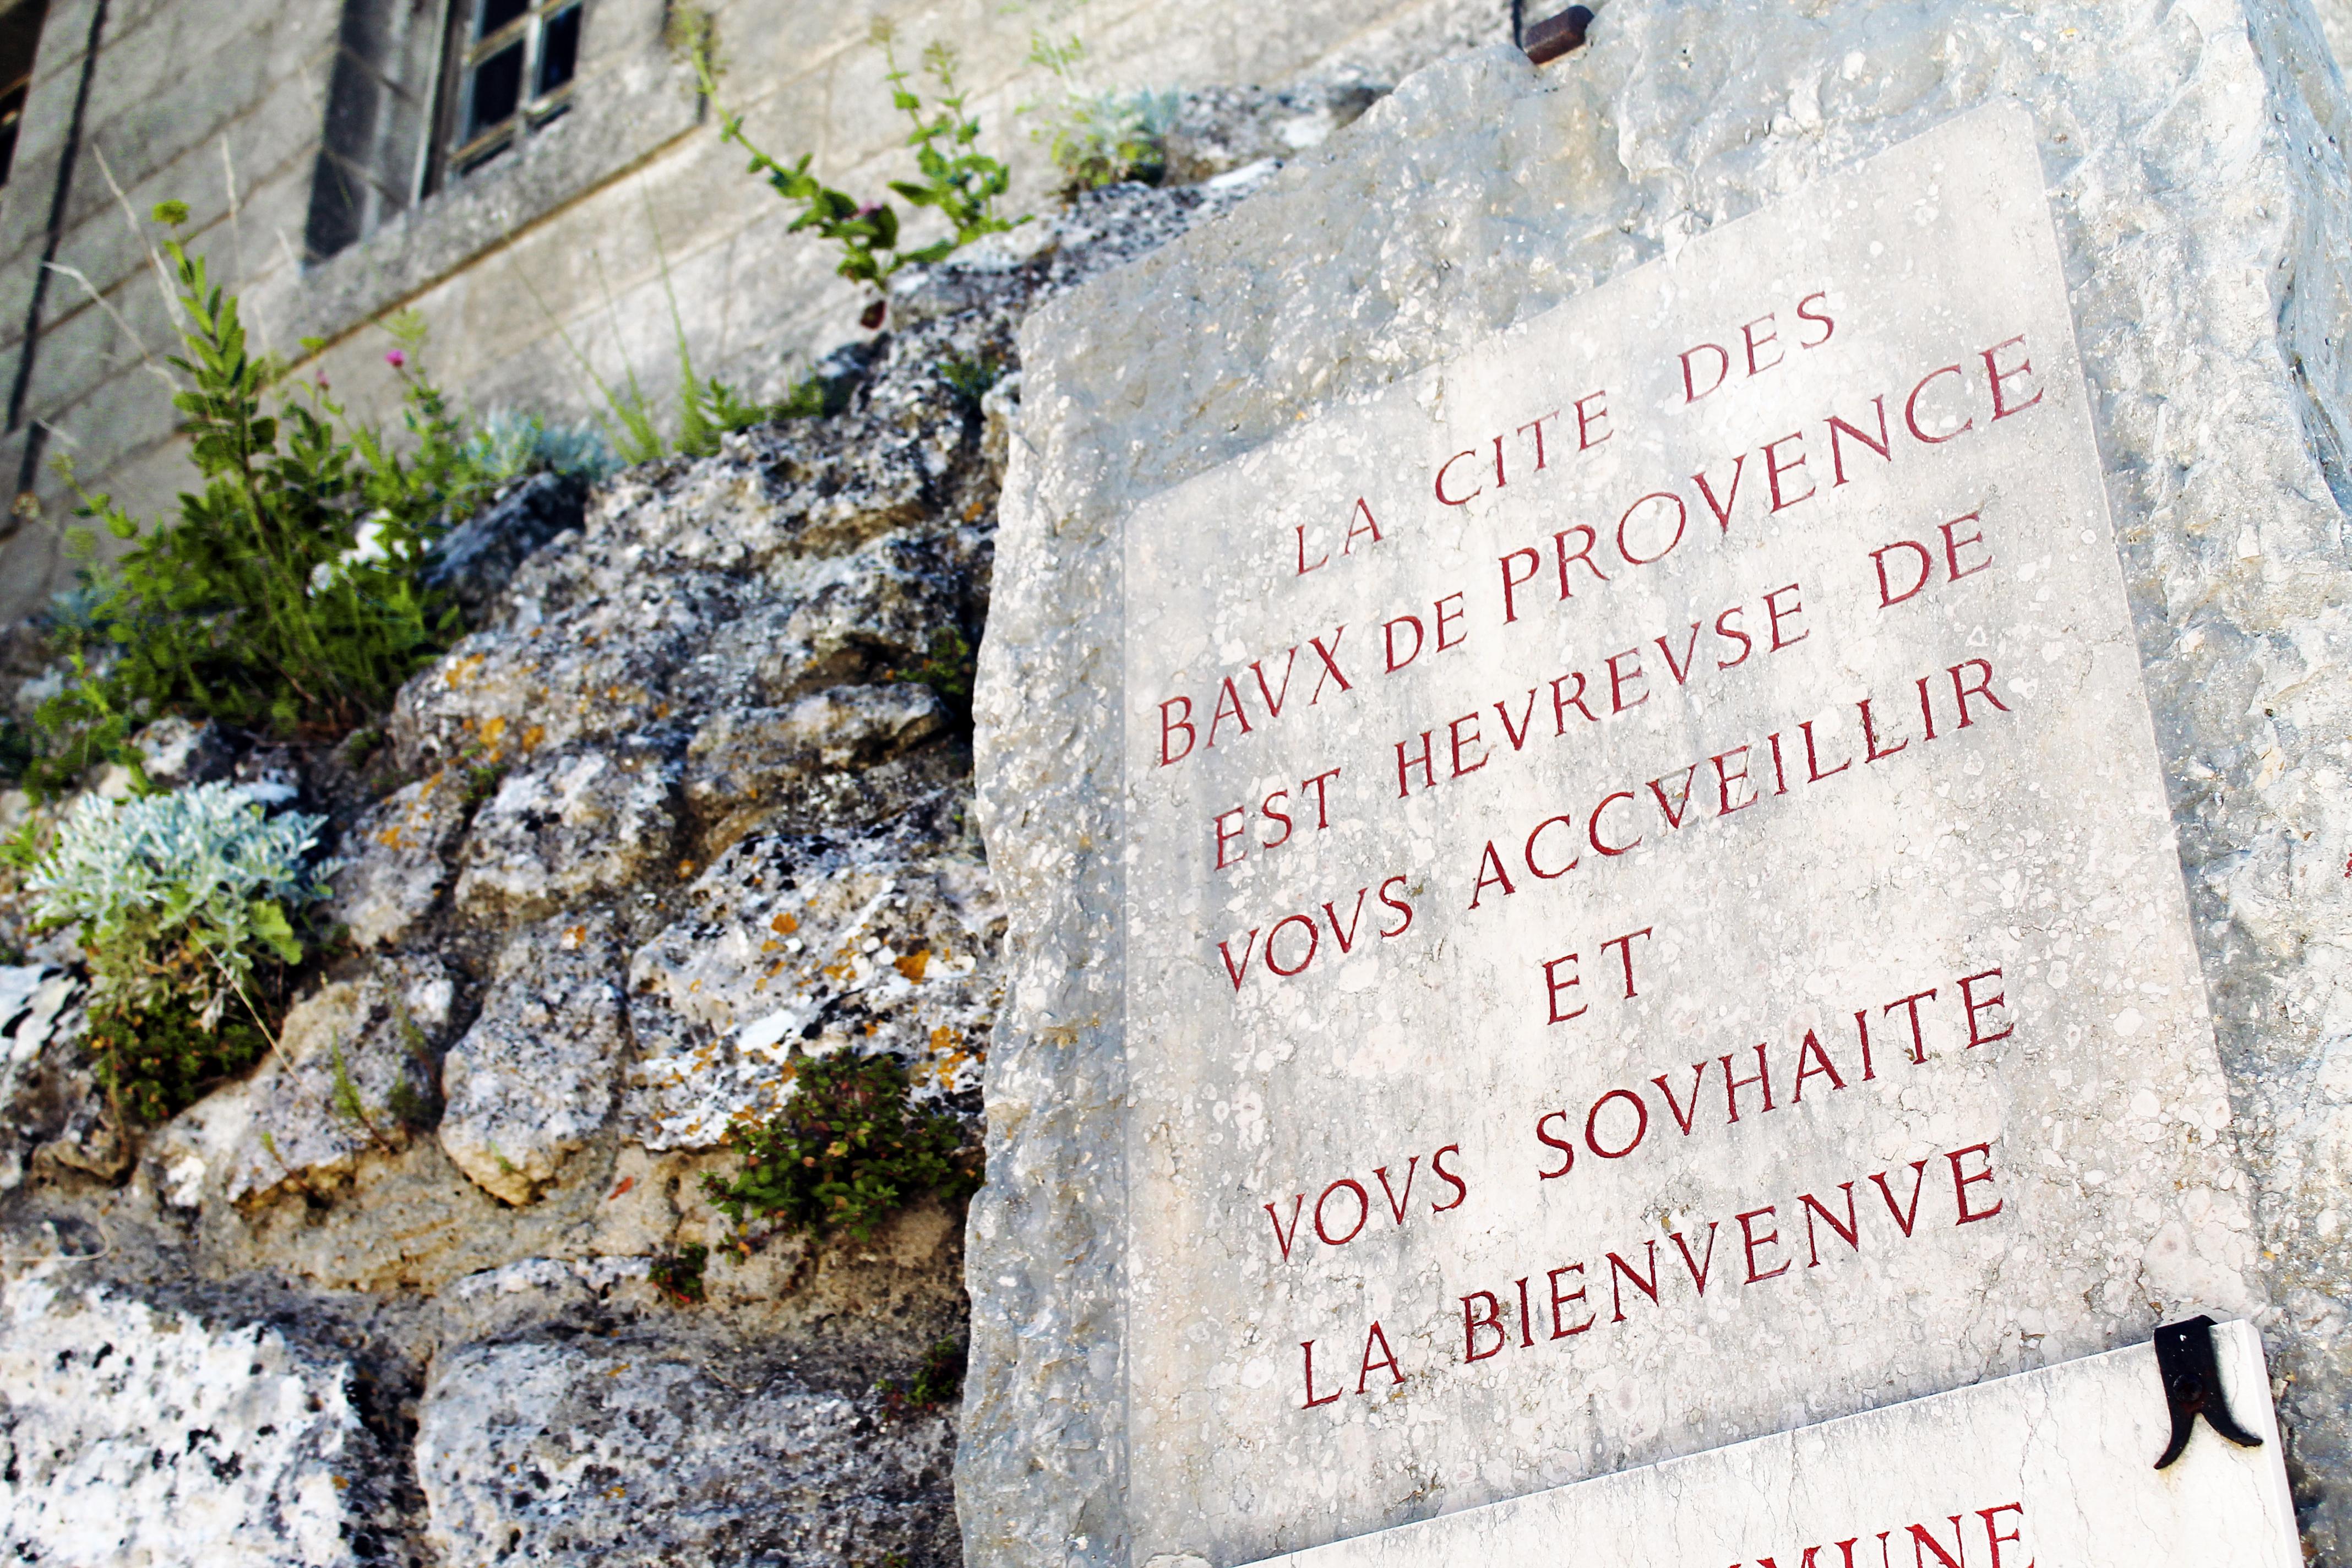 Visitar Gordes e Baux-de-Provence - Drawing Dreaming